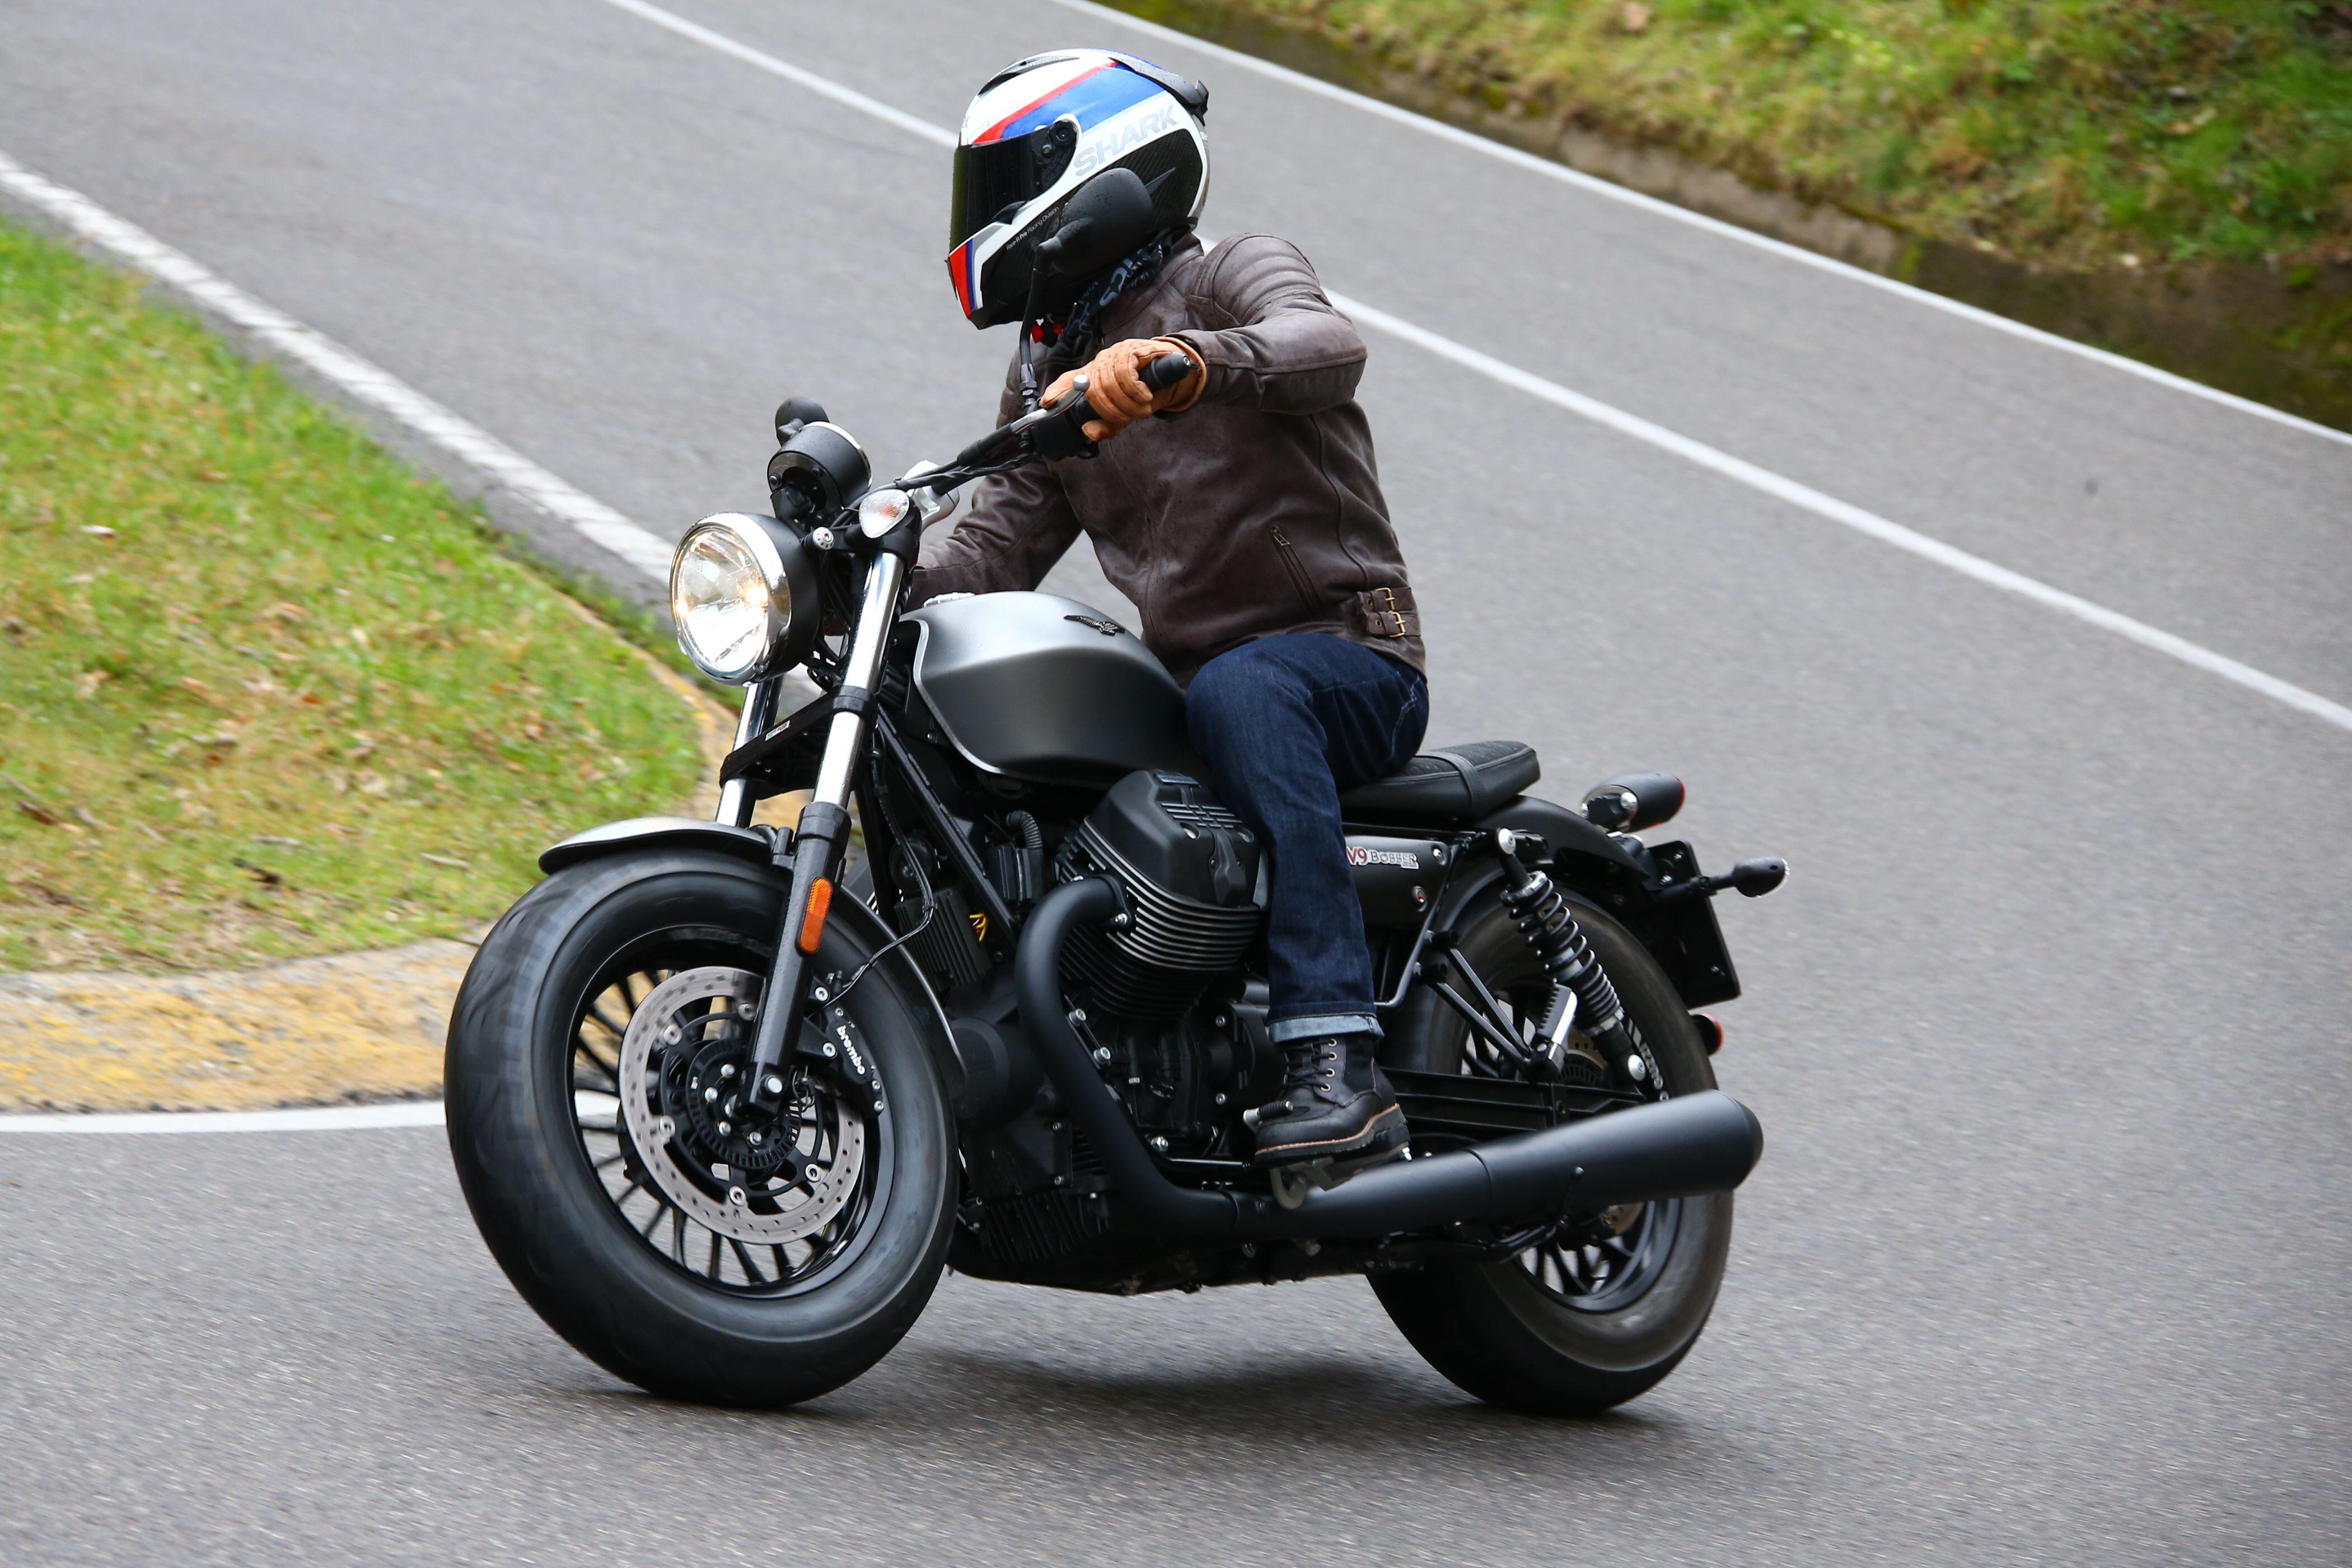 First ride: Moto Guzzi V9 review